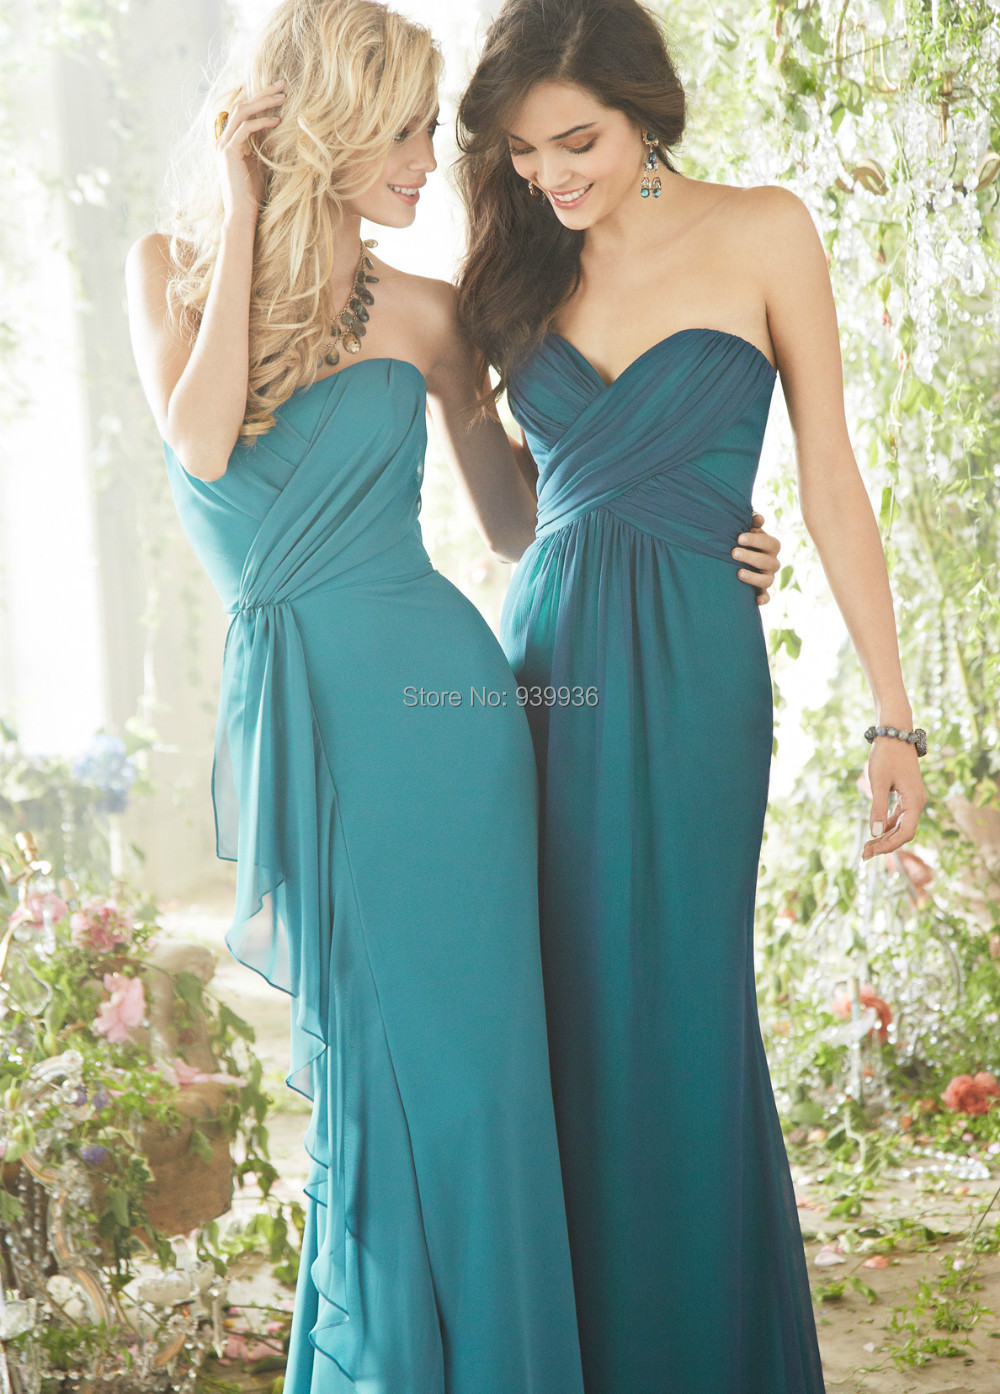 Magnificent Bridesmaid Dresses Armadale Images - Wedding Ideas ...